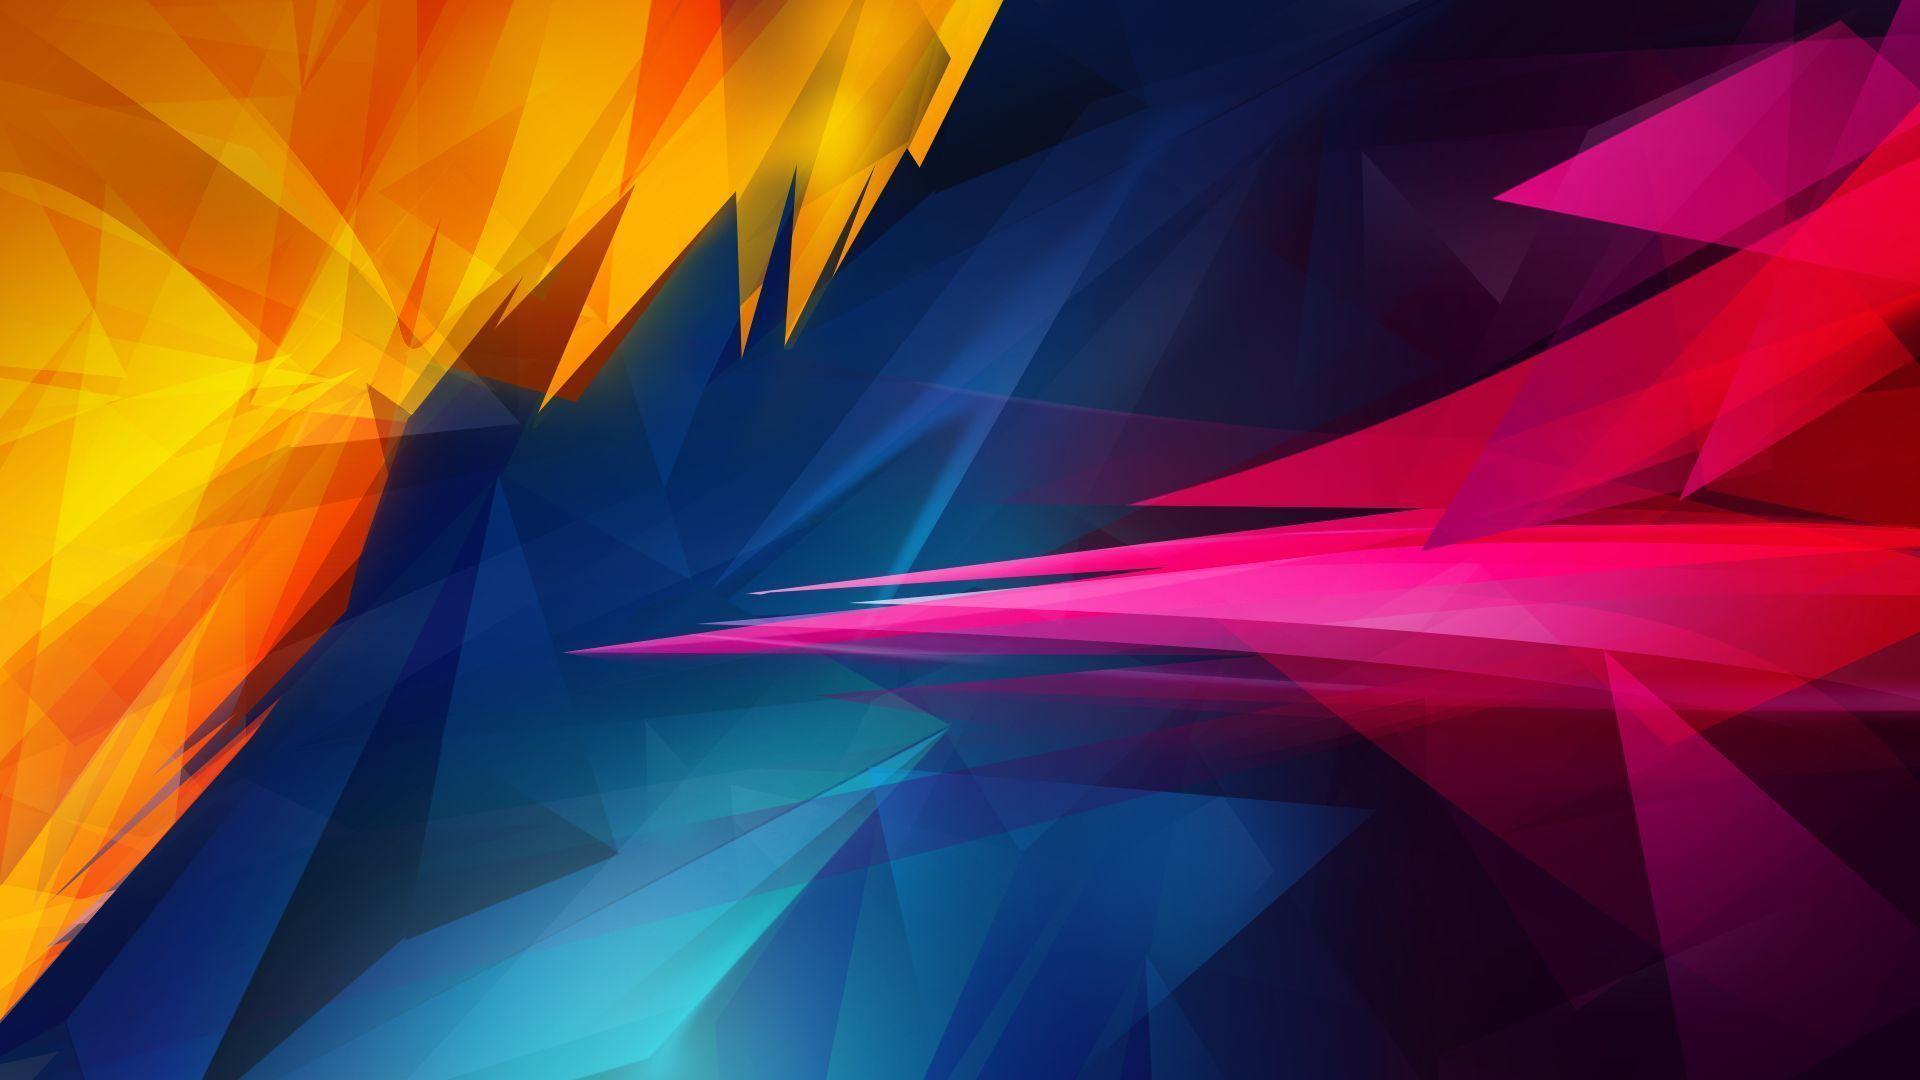 Abstract Ipad Wallpapers Top Free Abstract Ipad